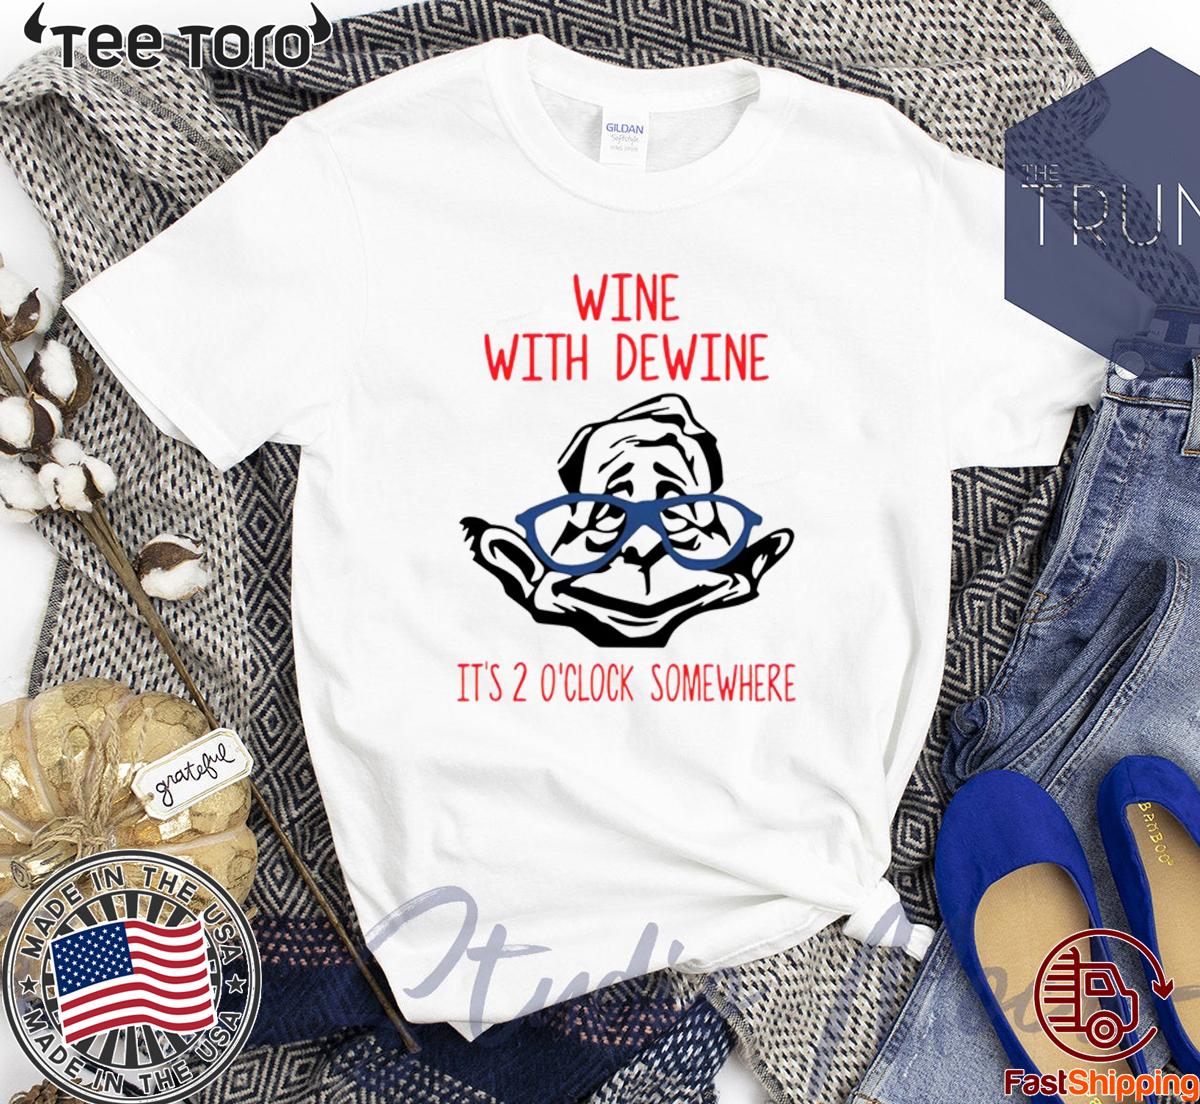 Wine with Dewine it's 2 o'clock somewhere 2020 T Shirt